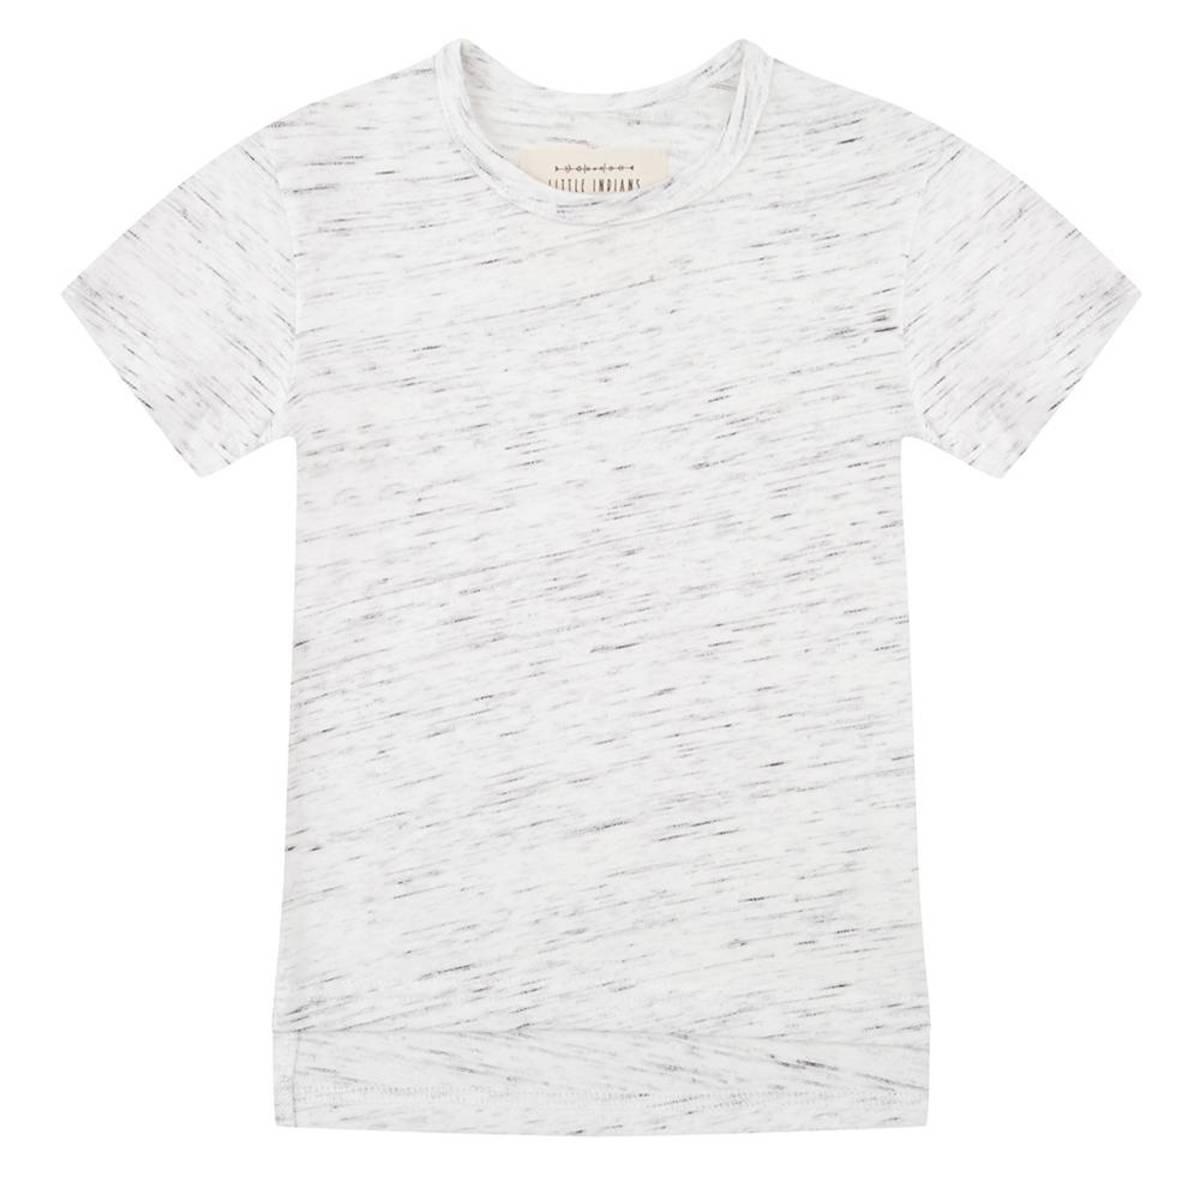 Hauts bébé Tee-Shirt manches courtes Marmer Gris - 12/18 mois Tee-Shirt manches courtes Marmer Gris - 12/18 mois